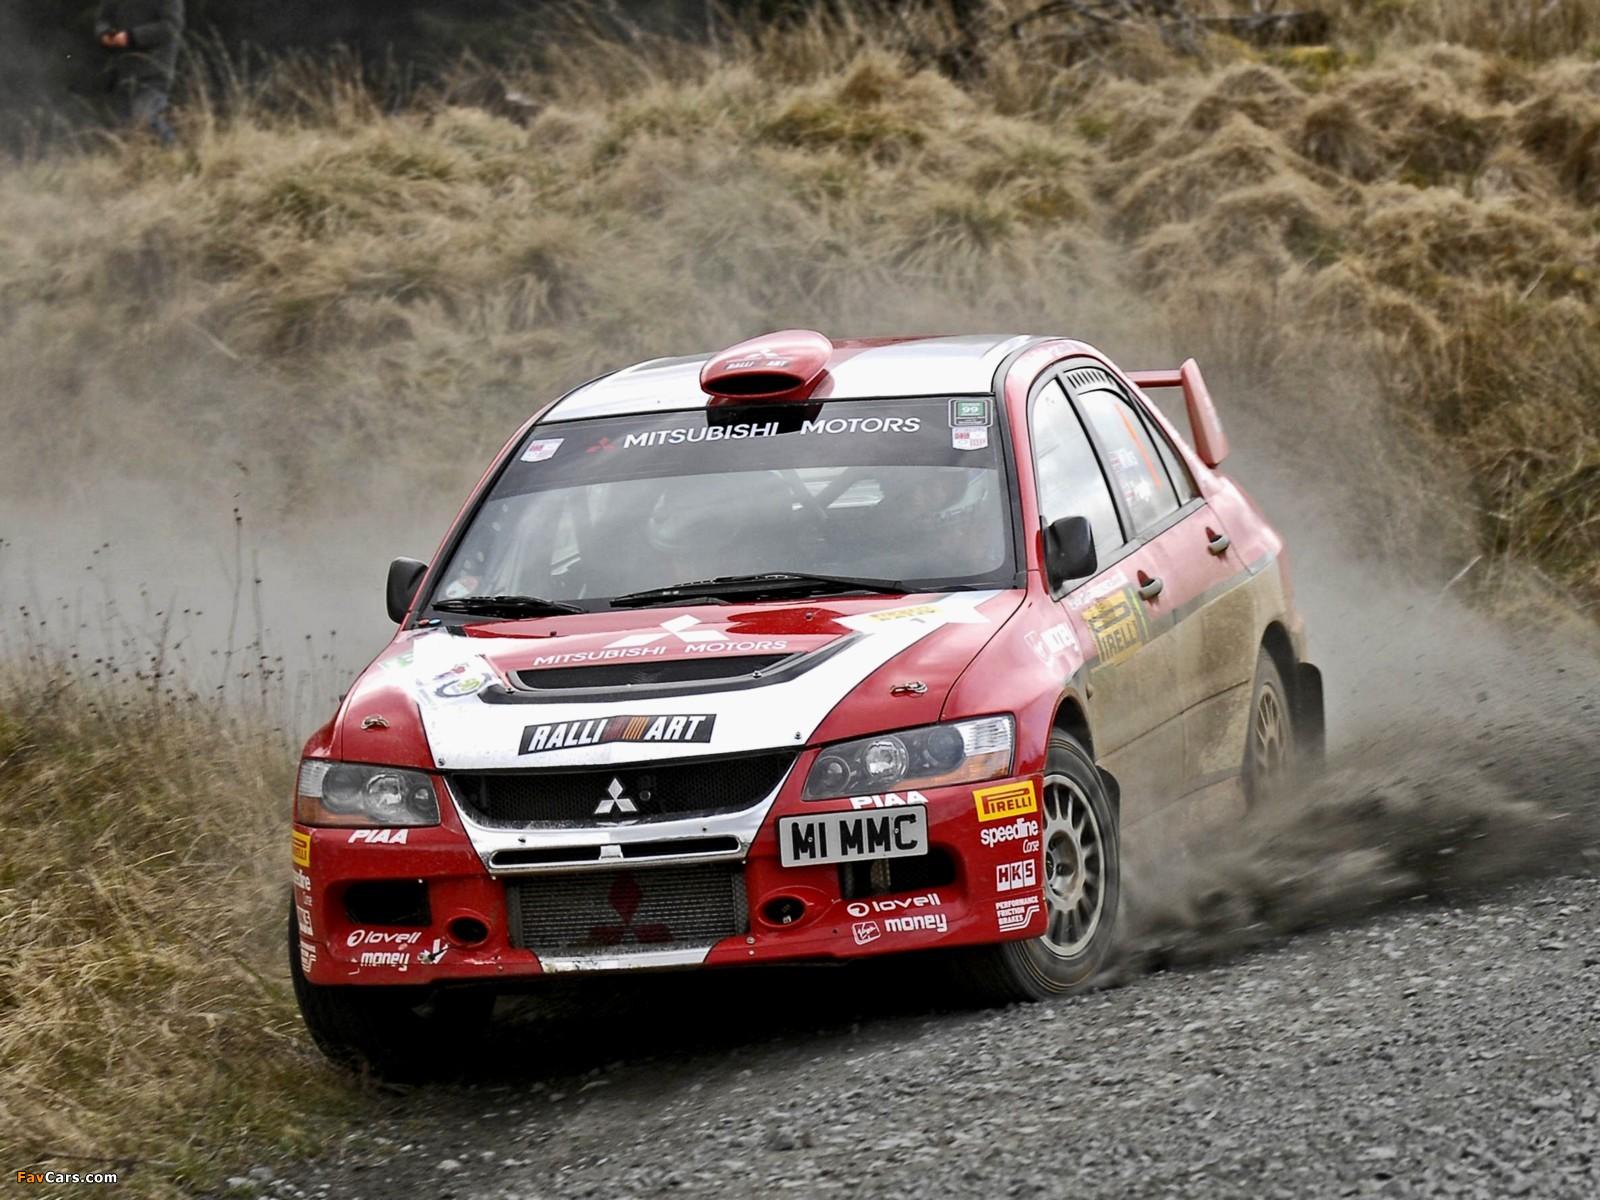 Mitsubishi Lancer Evolution IX Race Car 2005–07 photos (1600x1200)